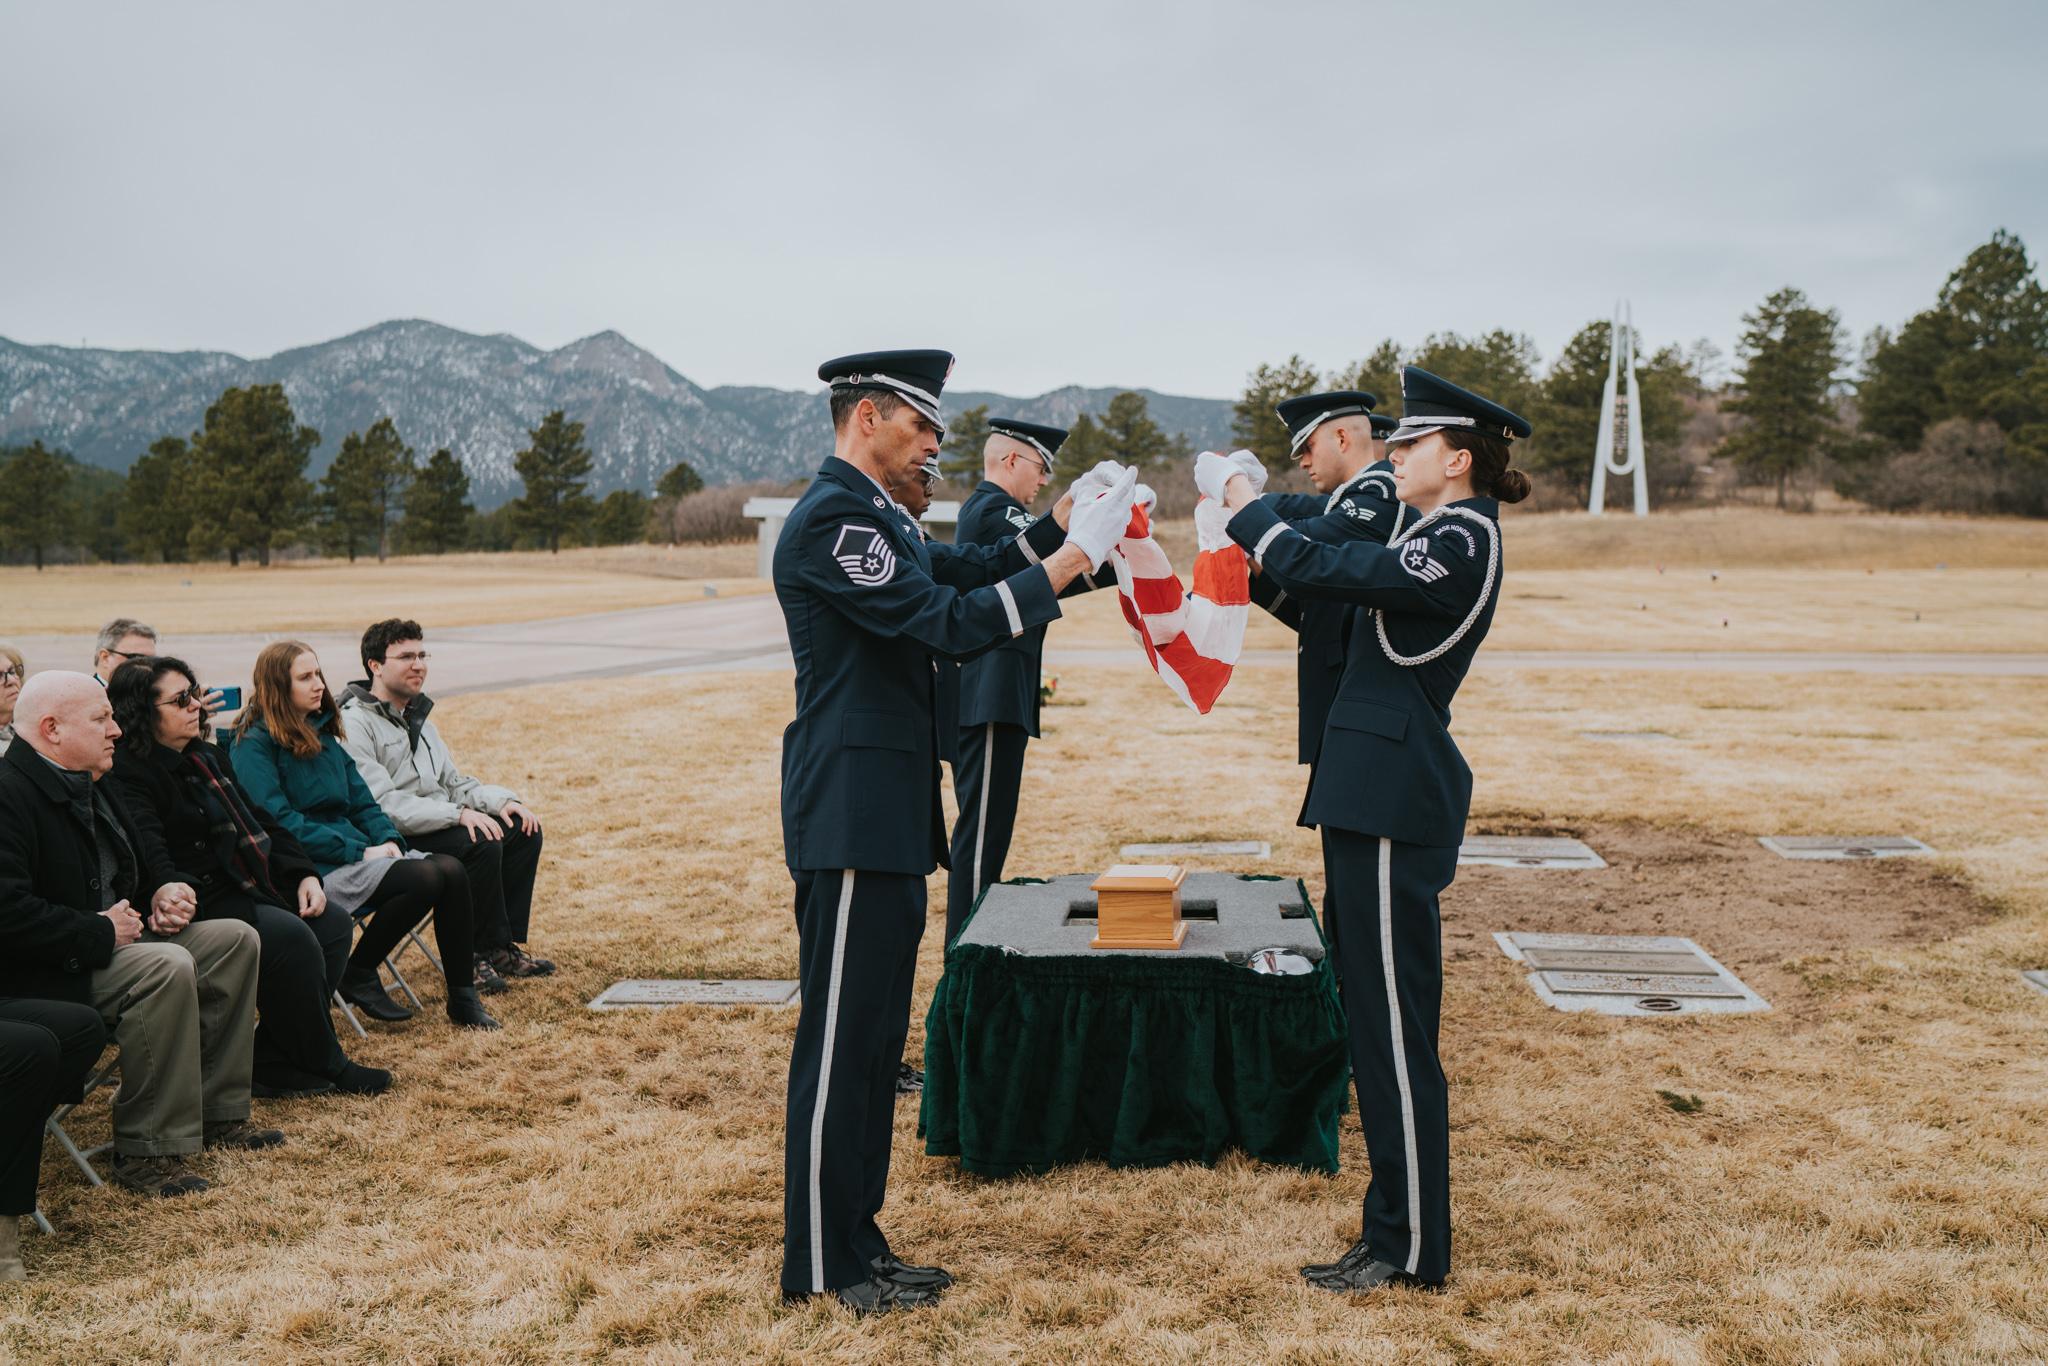 usafa-colorado-military-honours-burial-funeral-photography-grace-elizabeth-colchester-essex-alternative-wedding-lifestyle-photographer (42 of 127).jpg